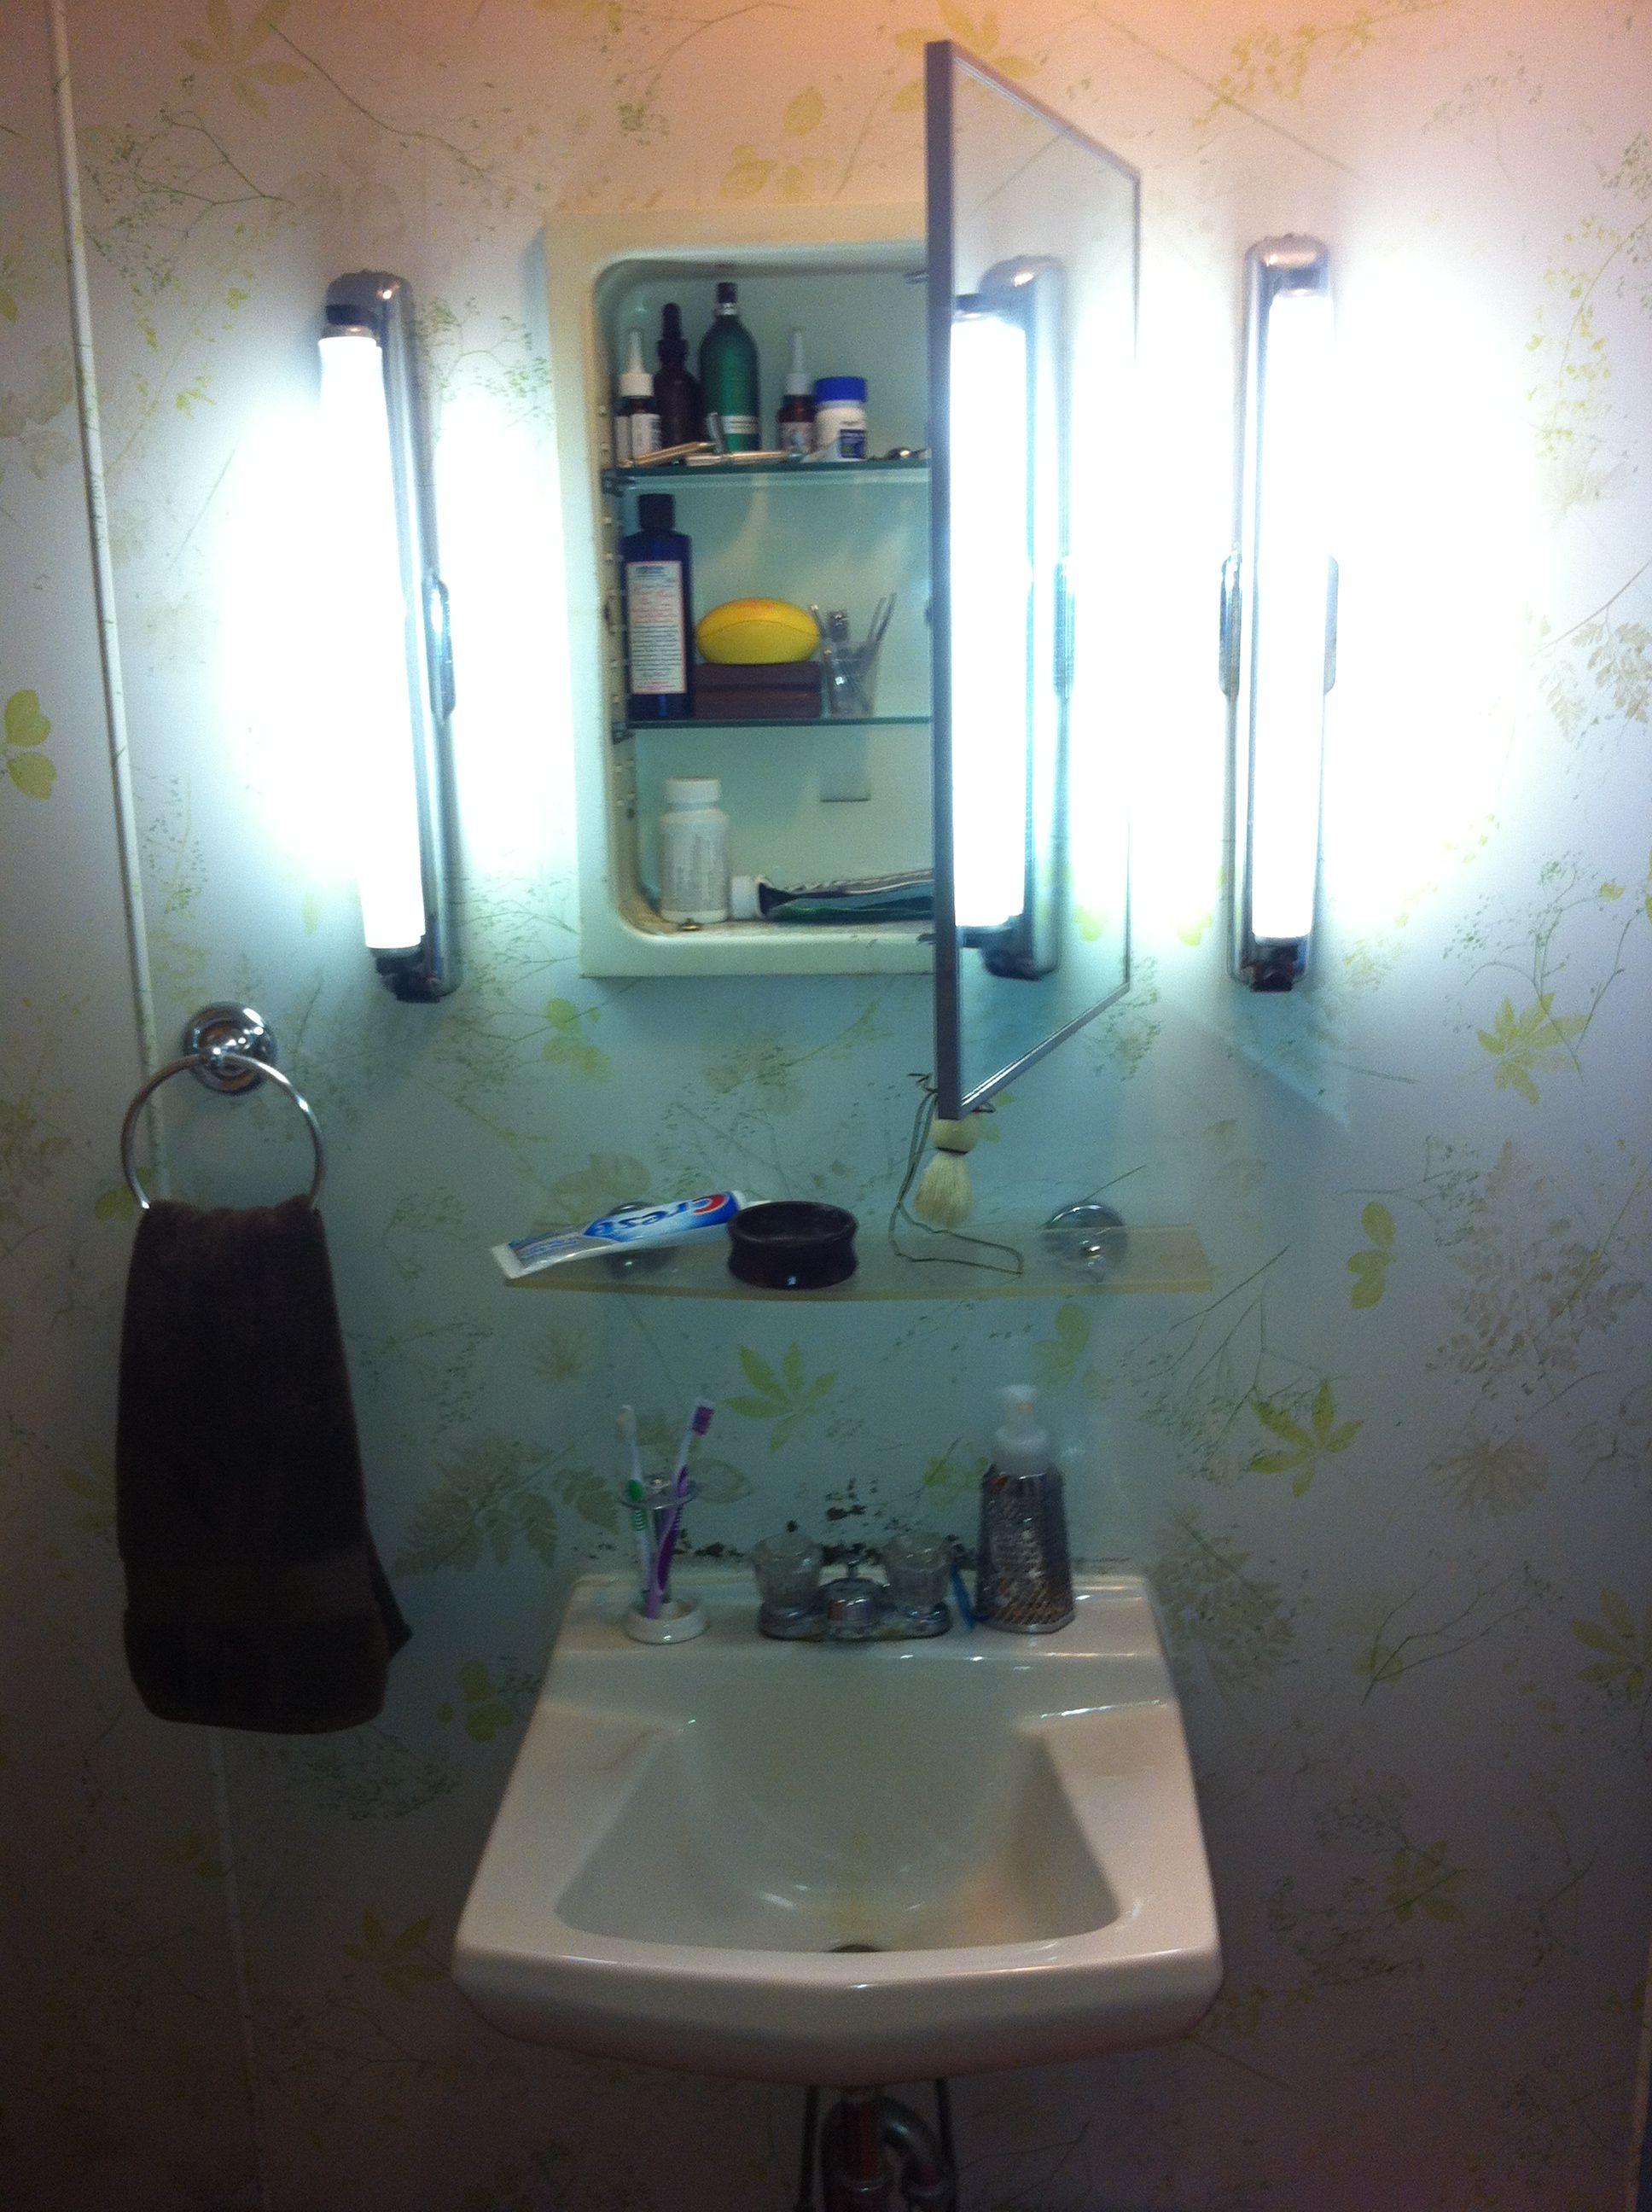 S Bathroom Arrangement The Best I Ve Ever Used